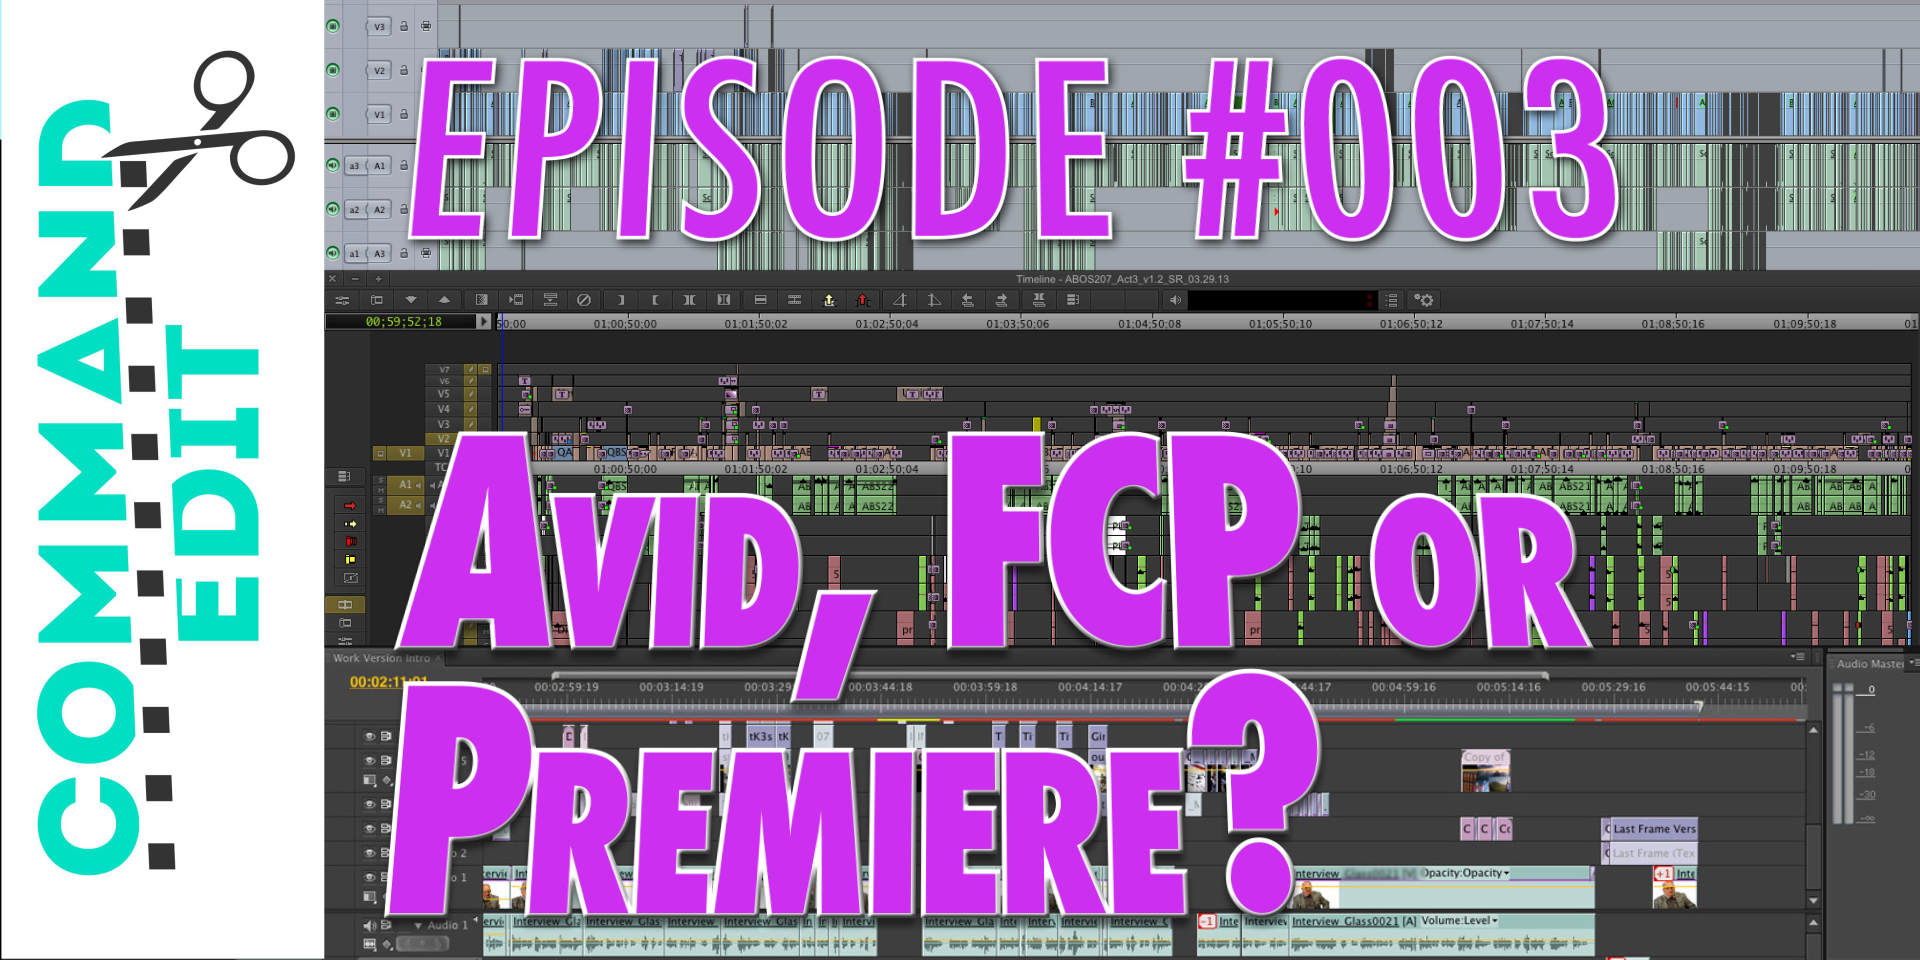 Command Edit Episode 3 Avid, Premiere or FCP